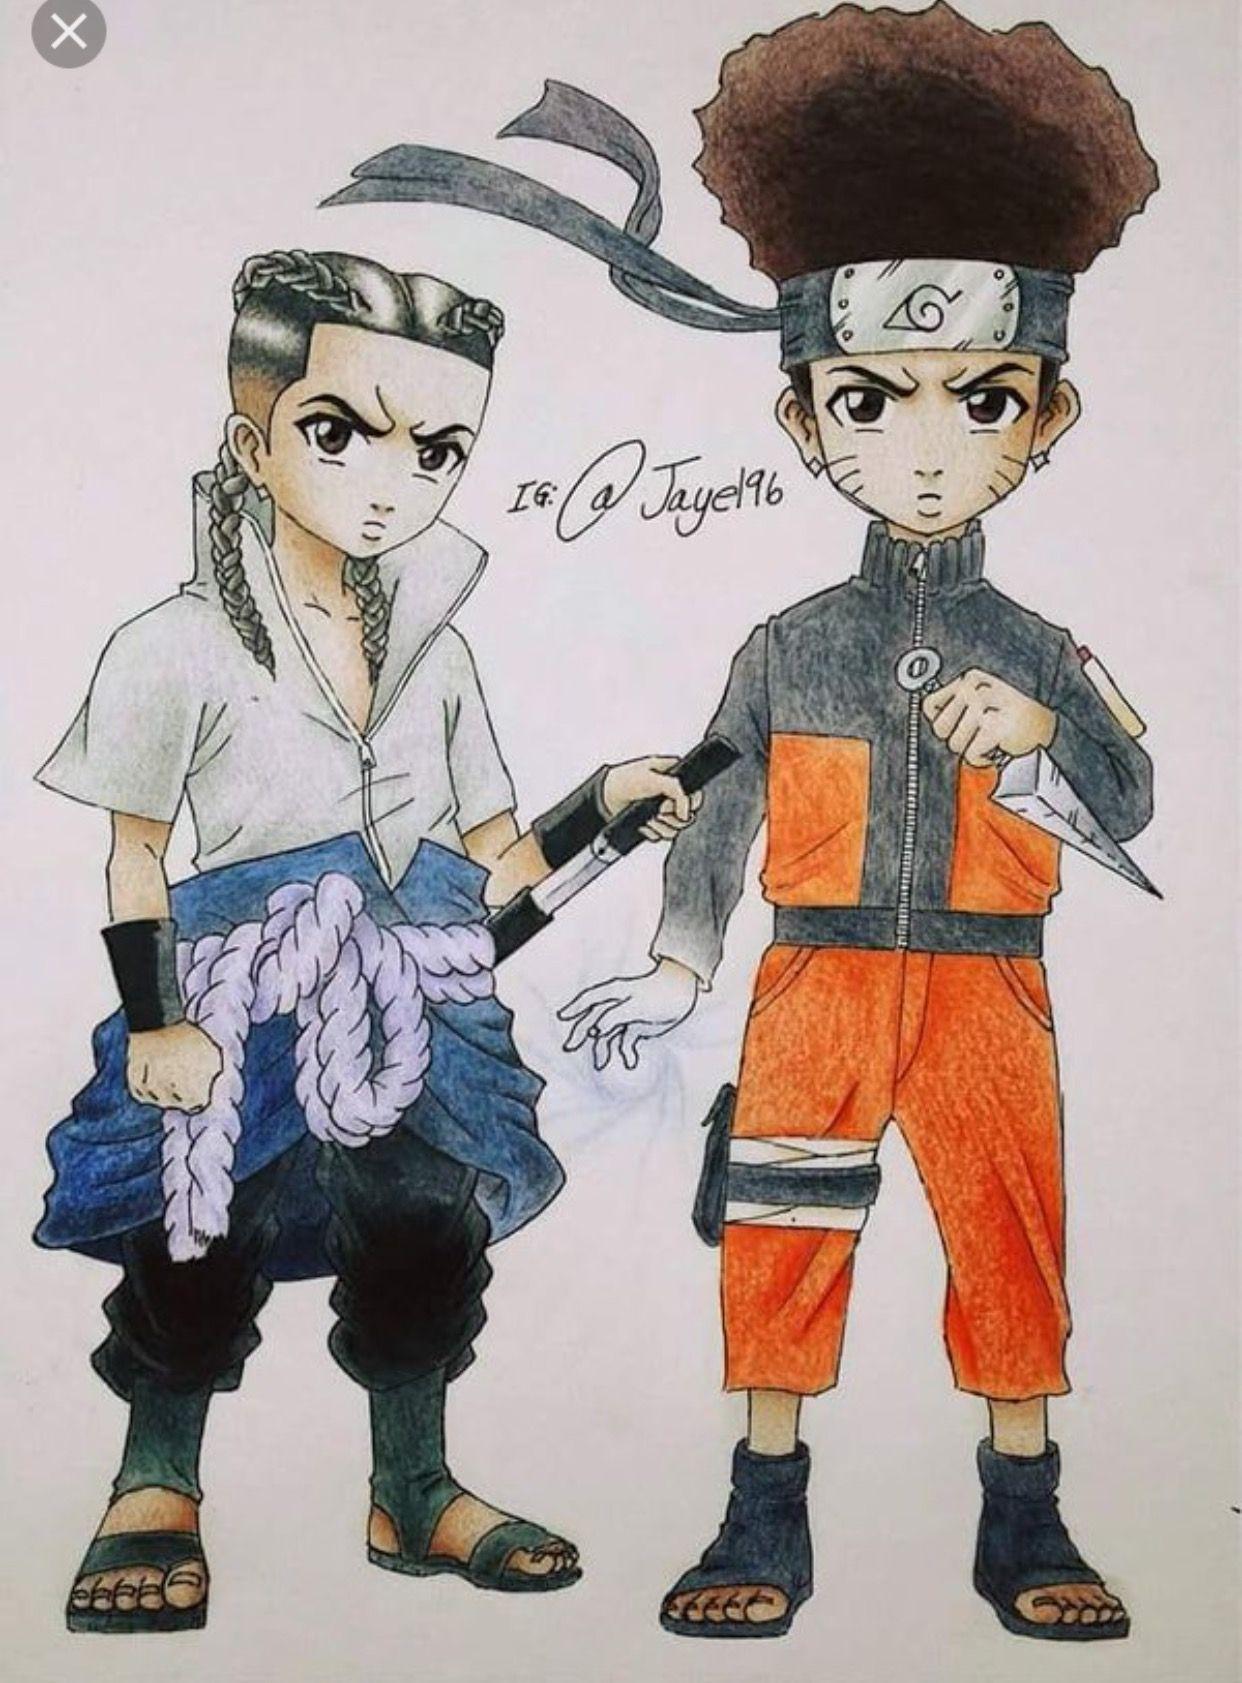 Boondocks Naruto And Sasuke Boondocks Drawings Aaron Mcgruder Black Anime Characters Supreme Wallpaper